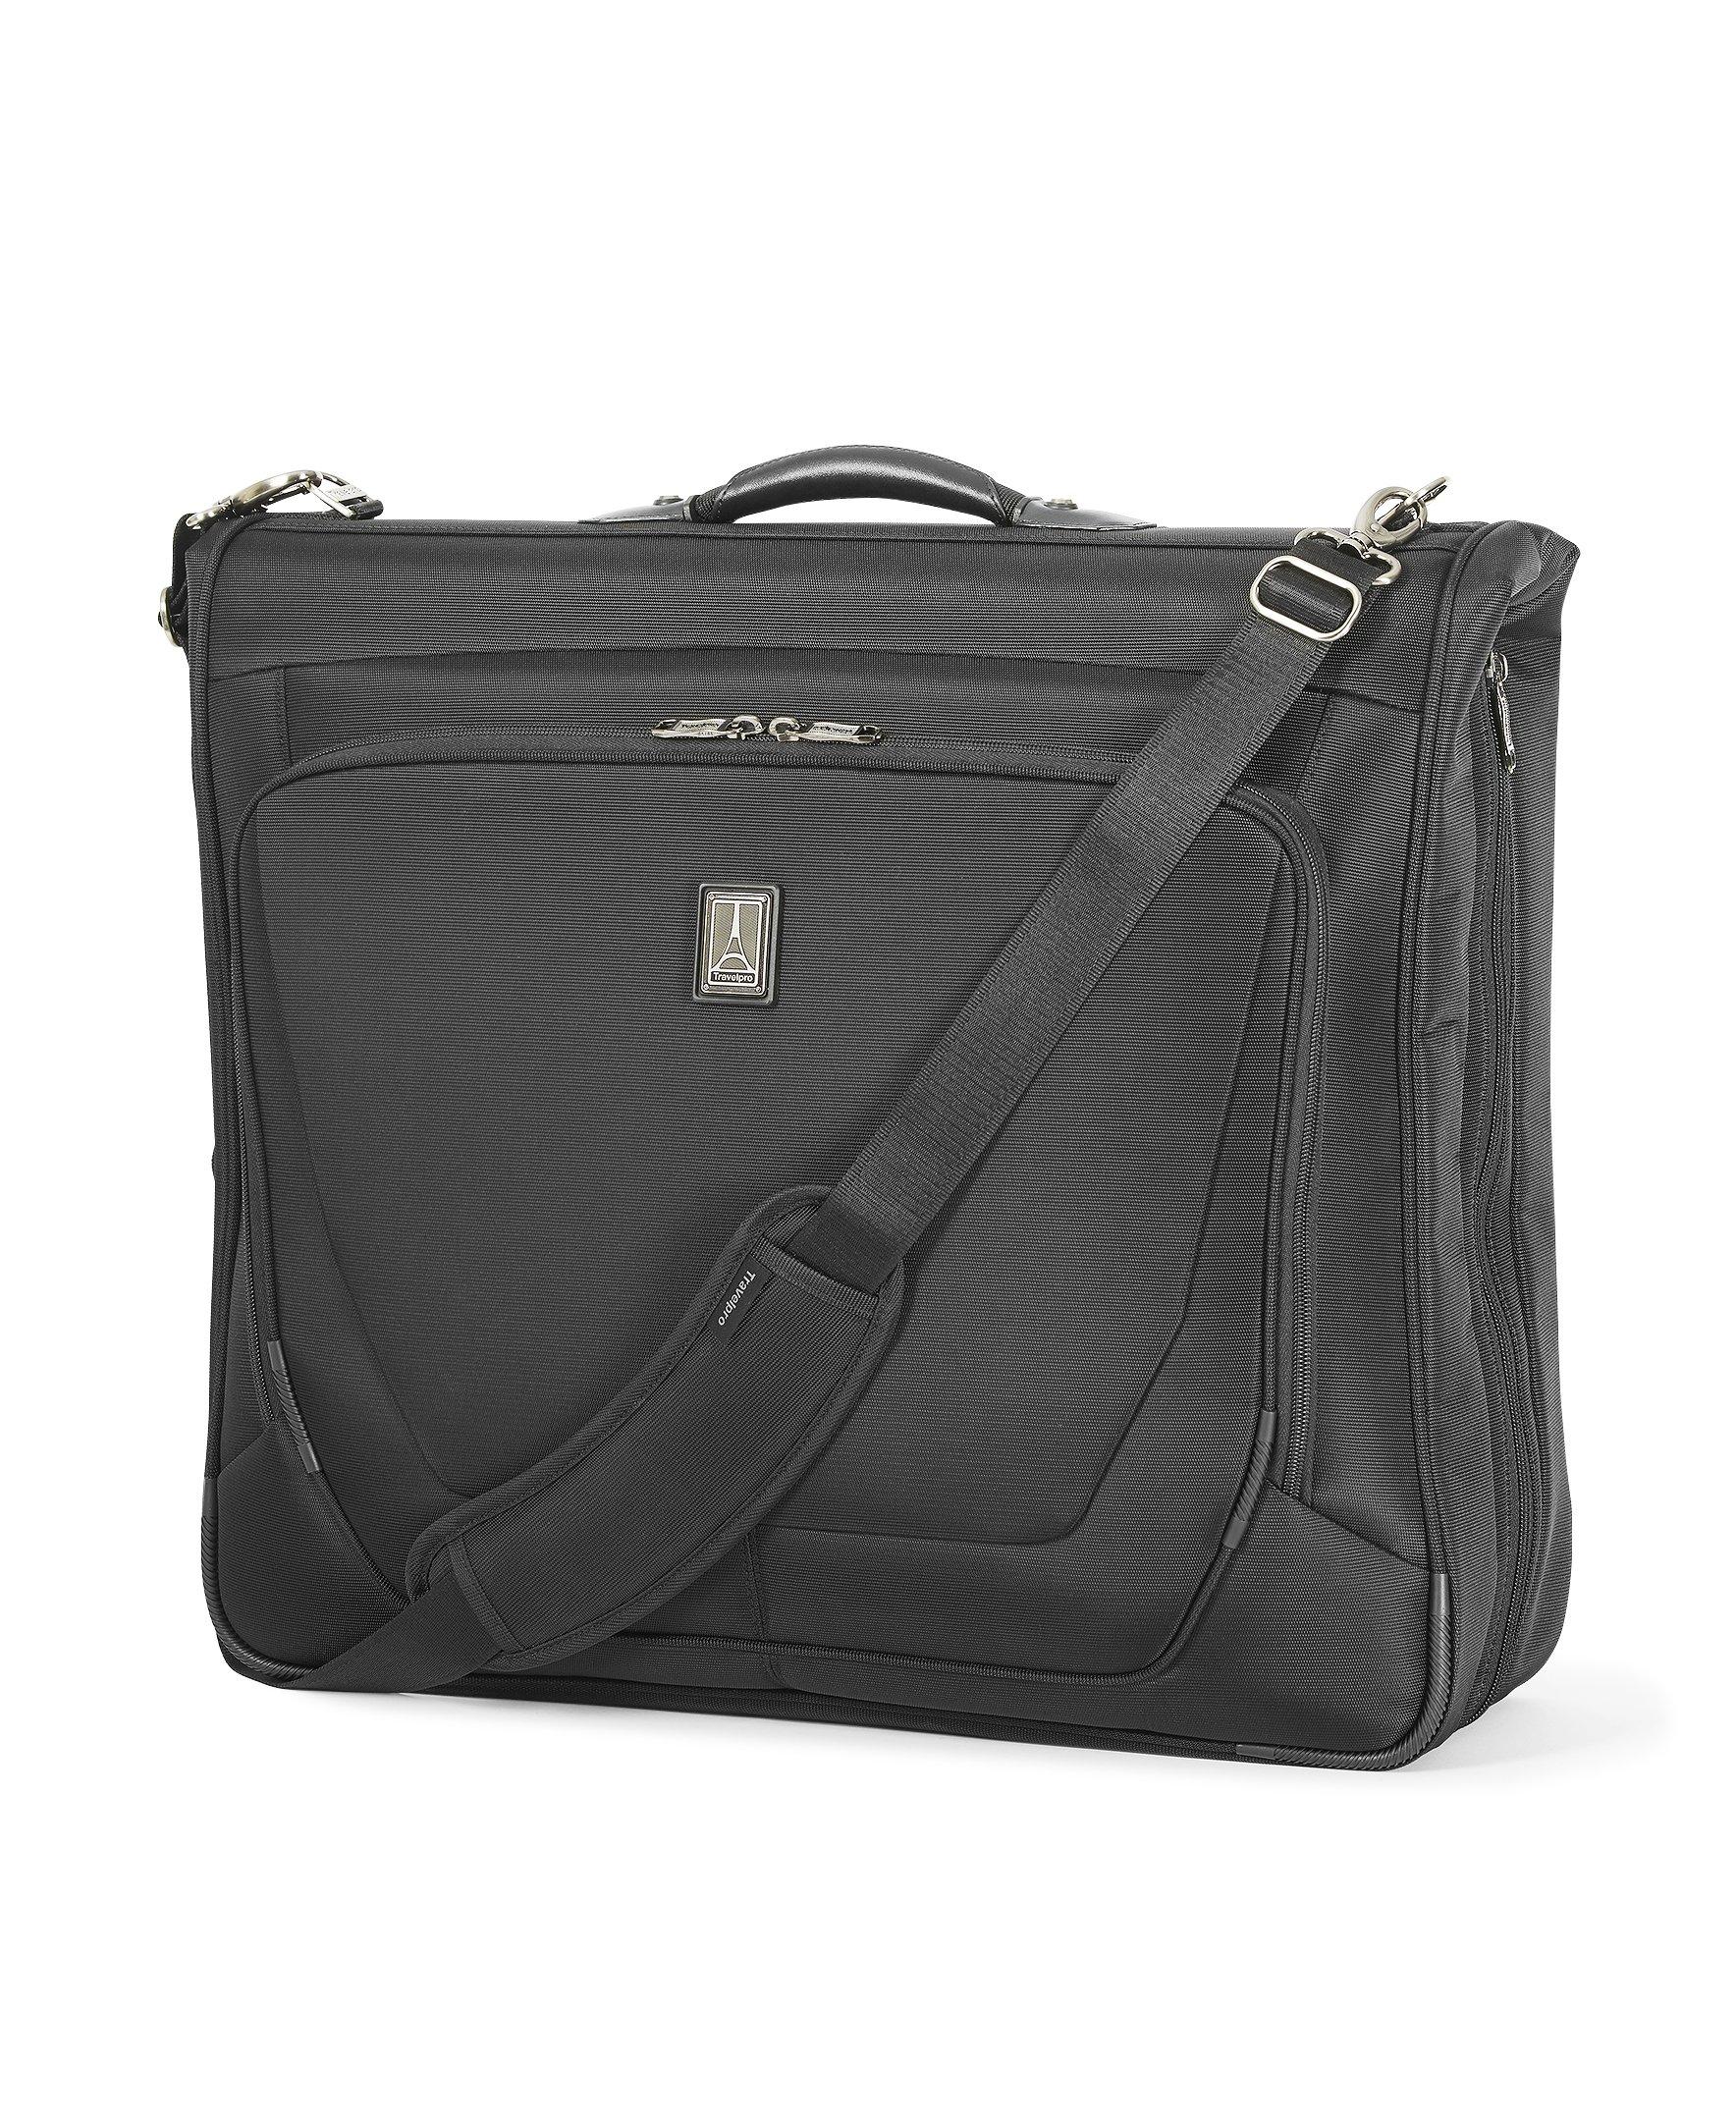 Travelpro Crew 11 Bifold Garment Bag, Black by Travelpro